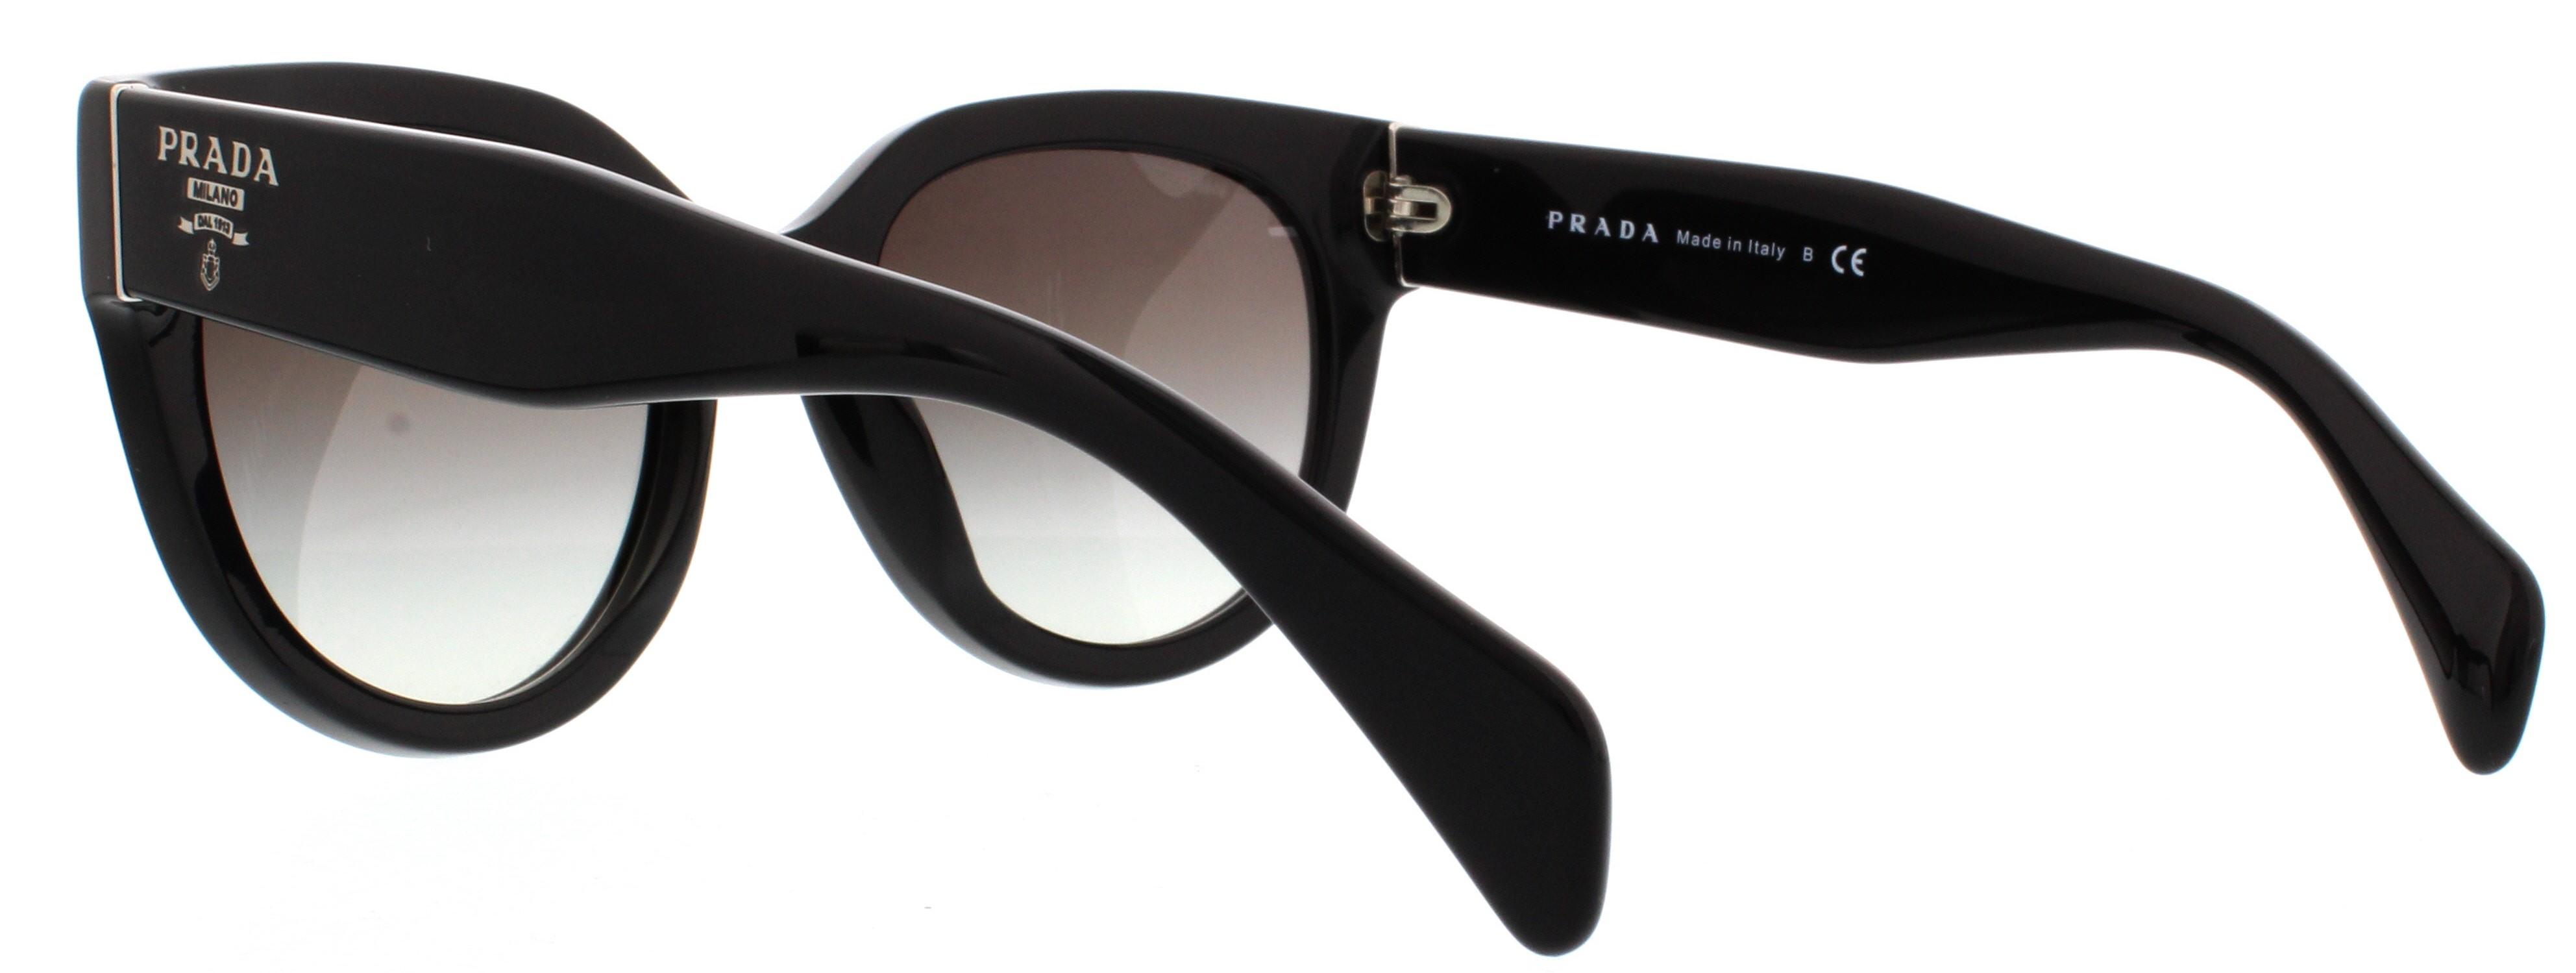 04912a57e3aa1 ... italy picture of prada sunglasses pr17os swing 29f9c 61655